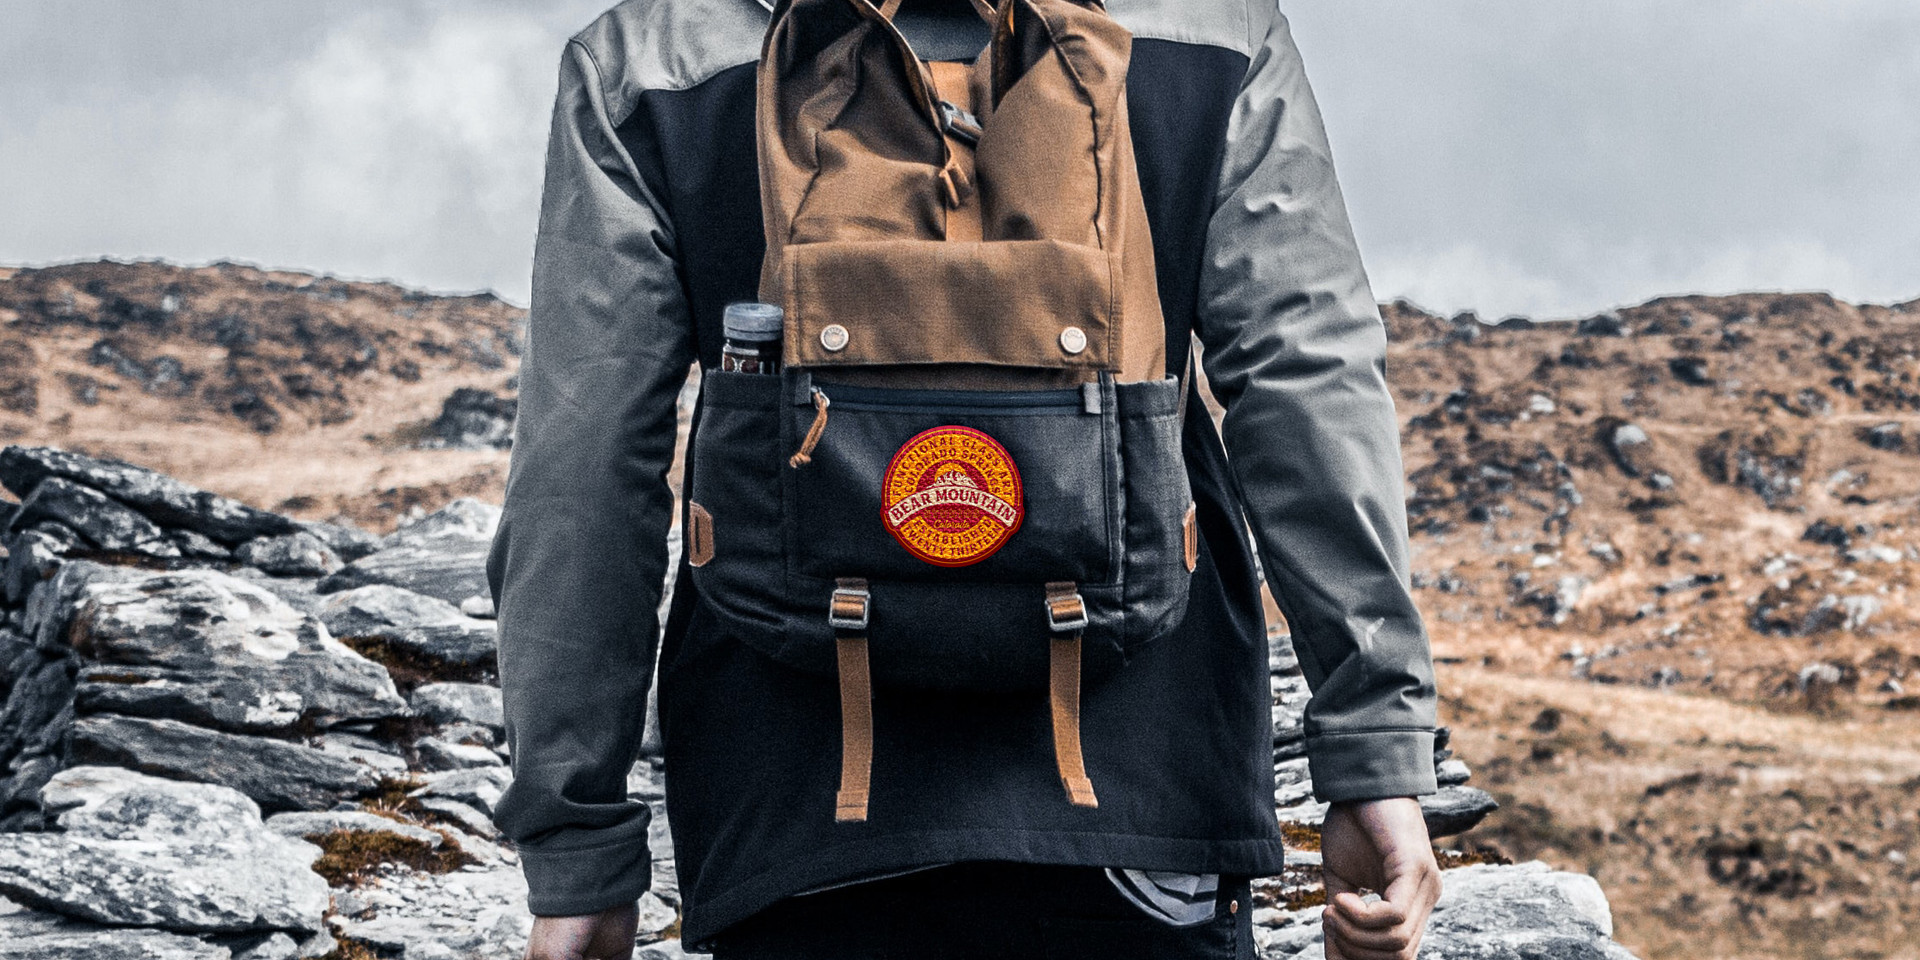 Bear Mountain - Badge - Patch.jpg